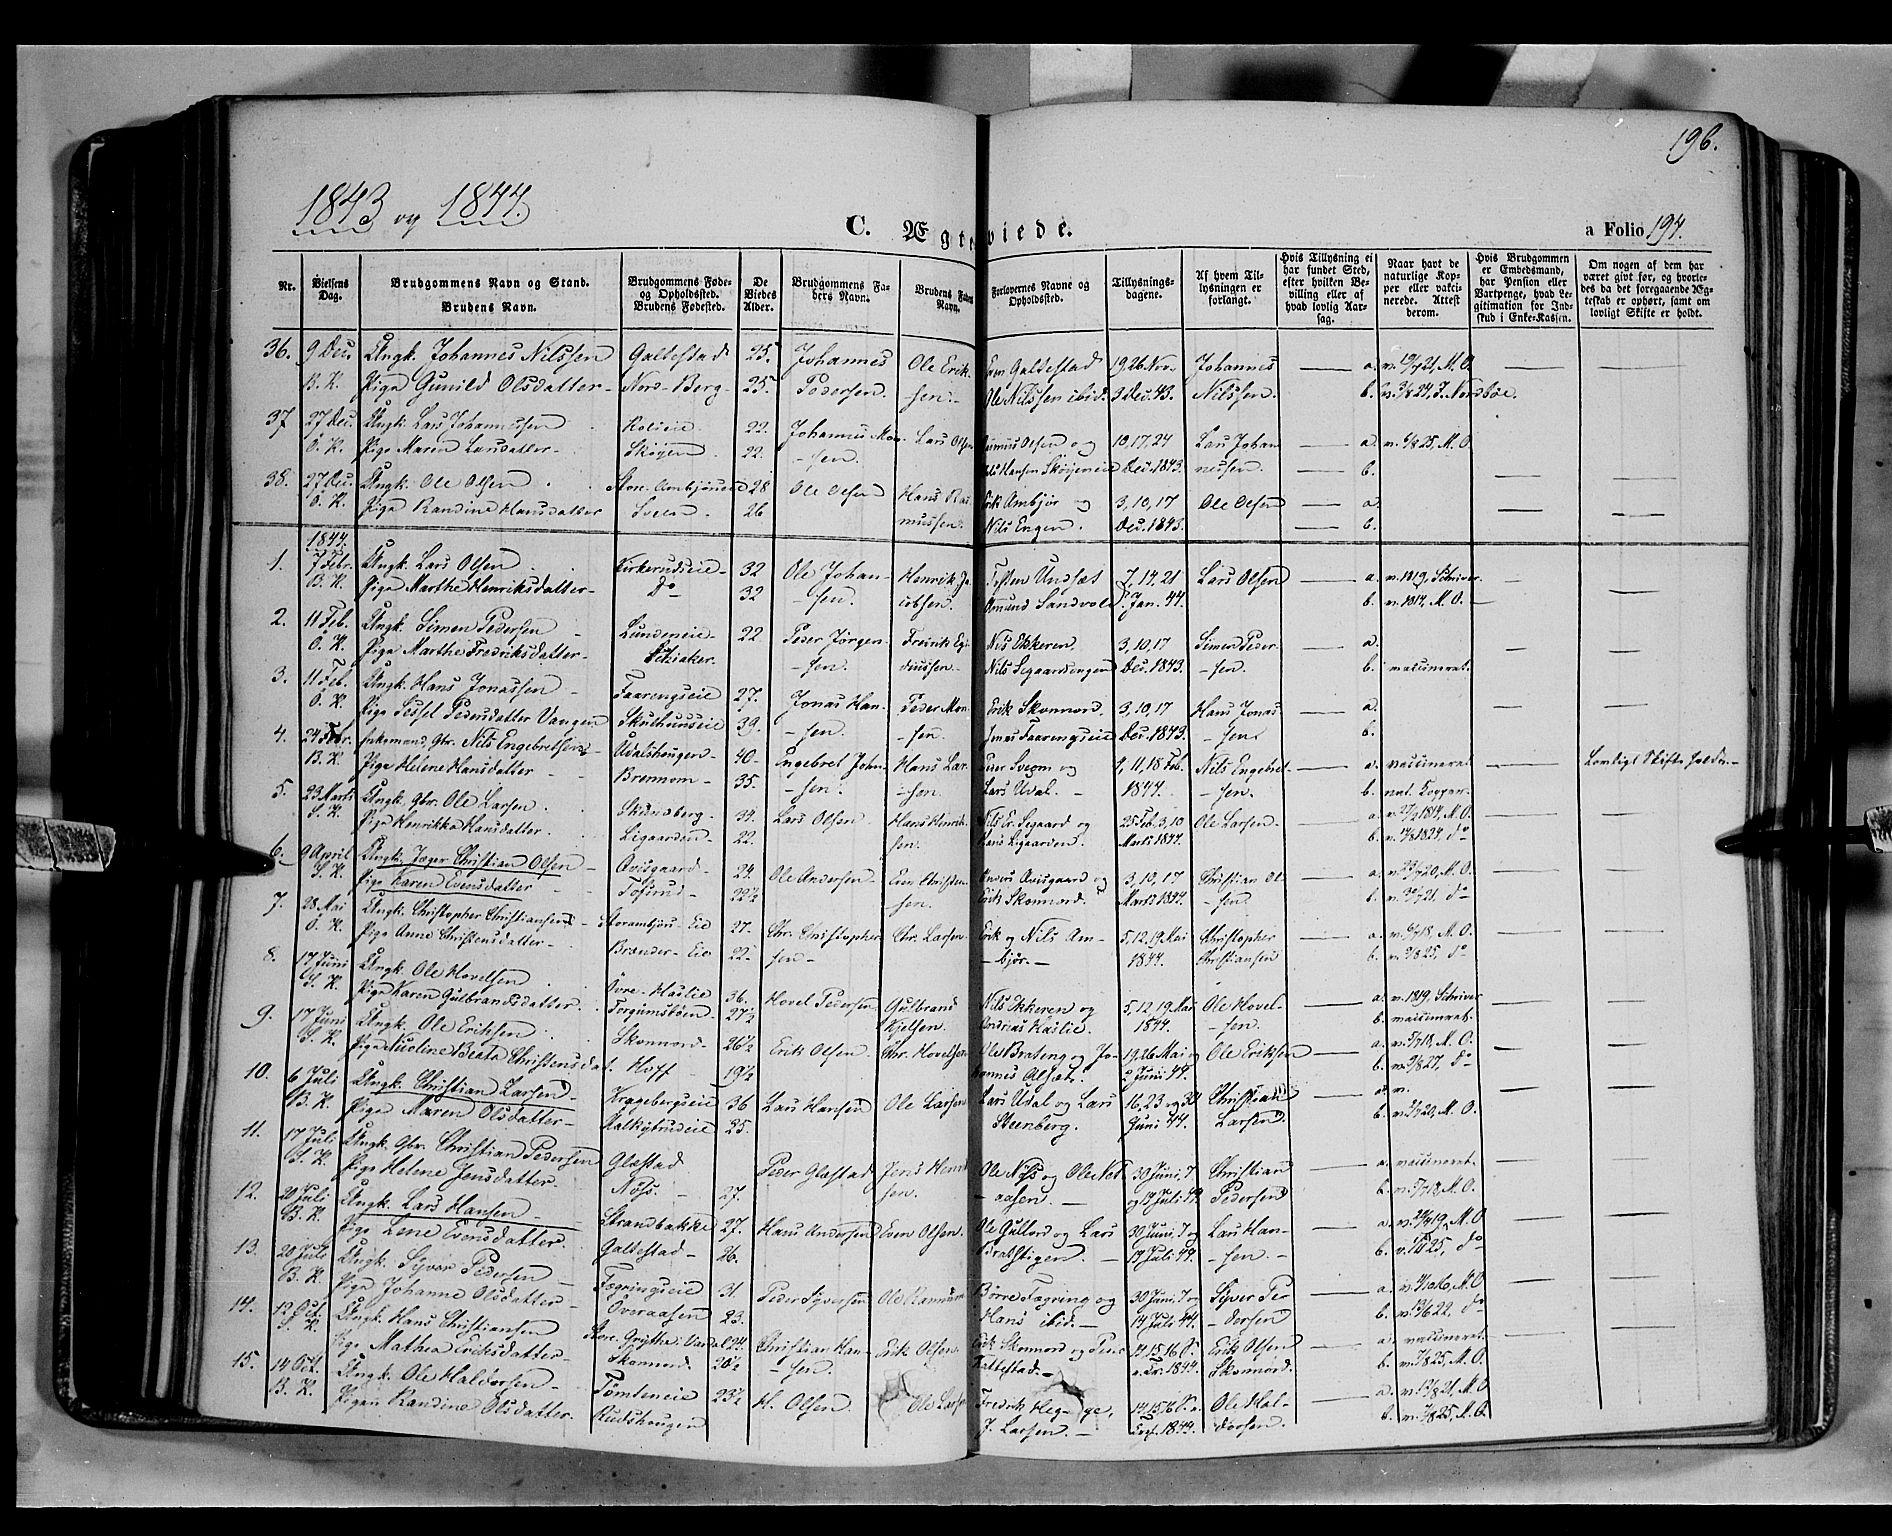 SAH, Biri prestekontor, Ministerialbok nr. 5, 1843-1854, s. 196